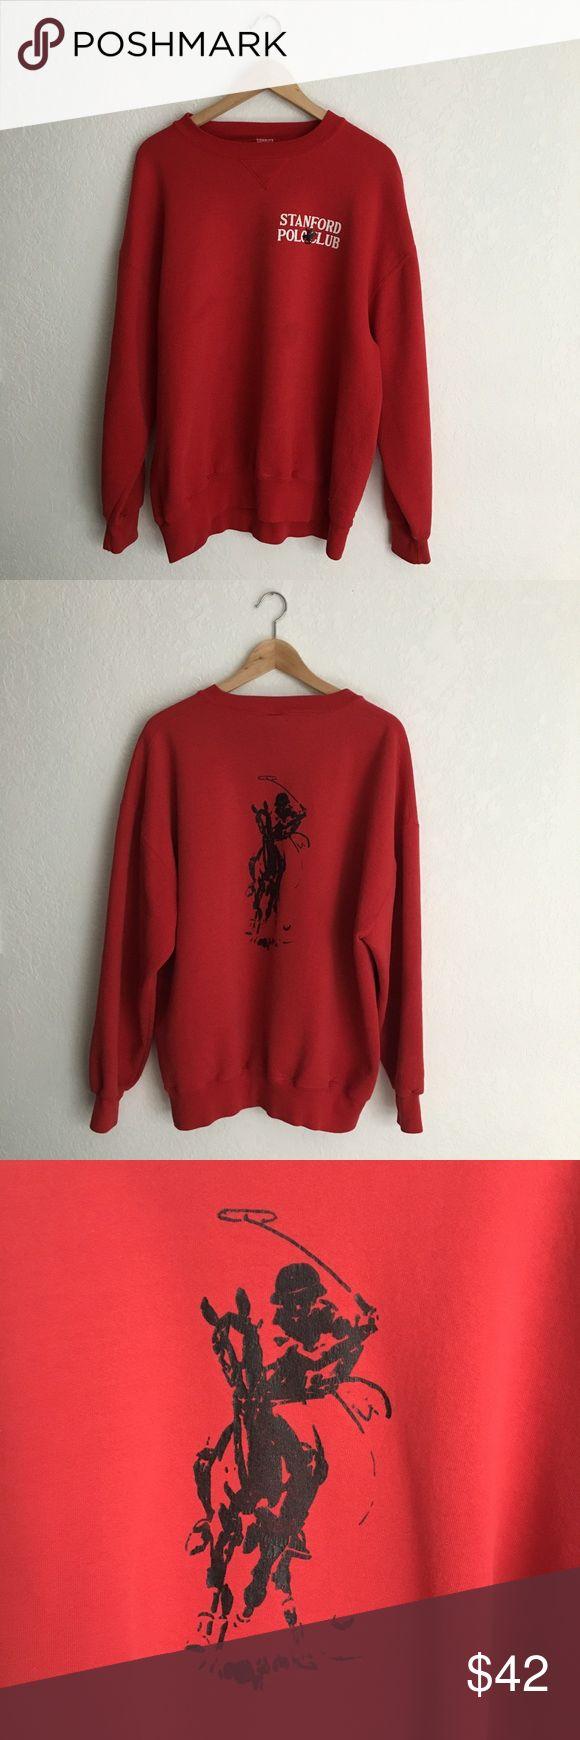 "Vintage Stanford Polo Club Sweatshirt Great comfy crewneck sweatshirt. Good vintage shape. Tag size XL. Best for ladies S/M. 25"" across chest, 25"" length from shoulder. Vintage Tops Sweatshirts & Hoodies"